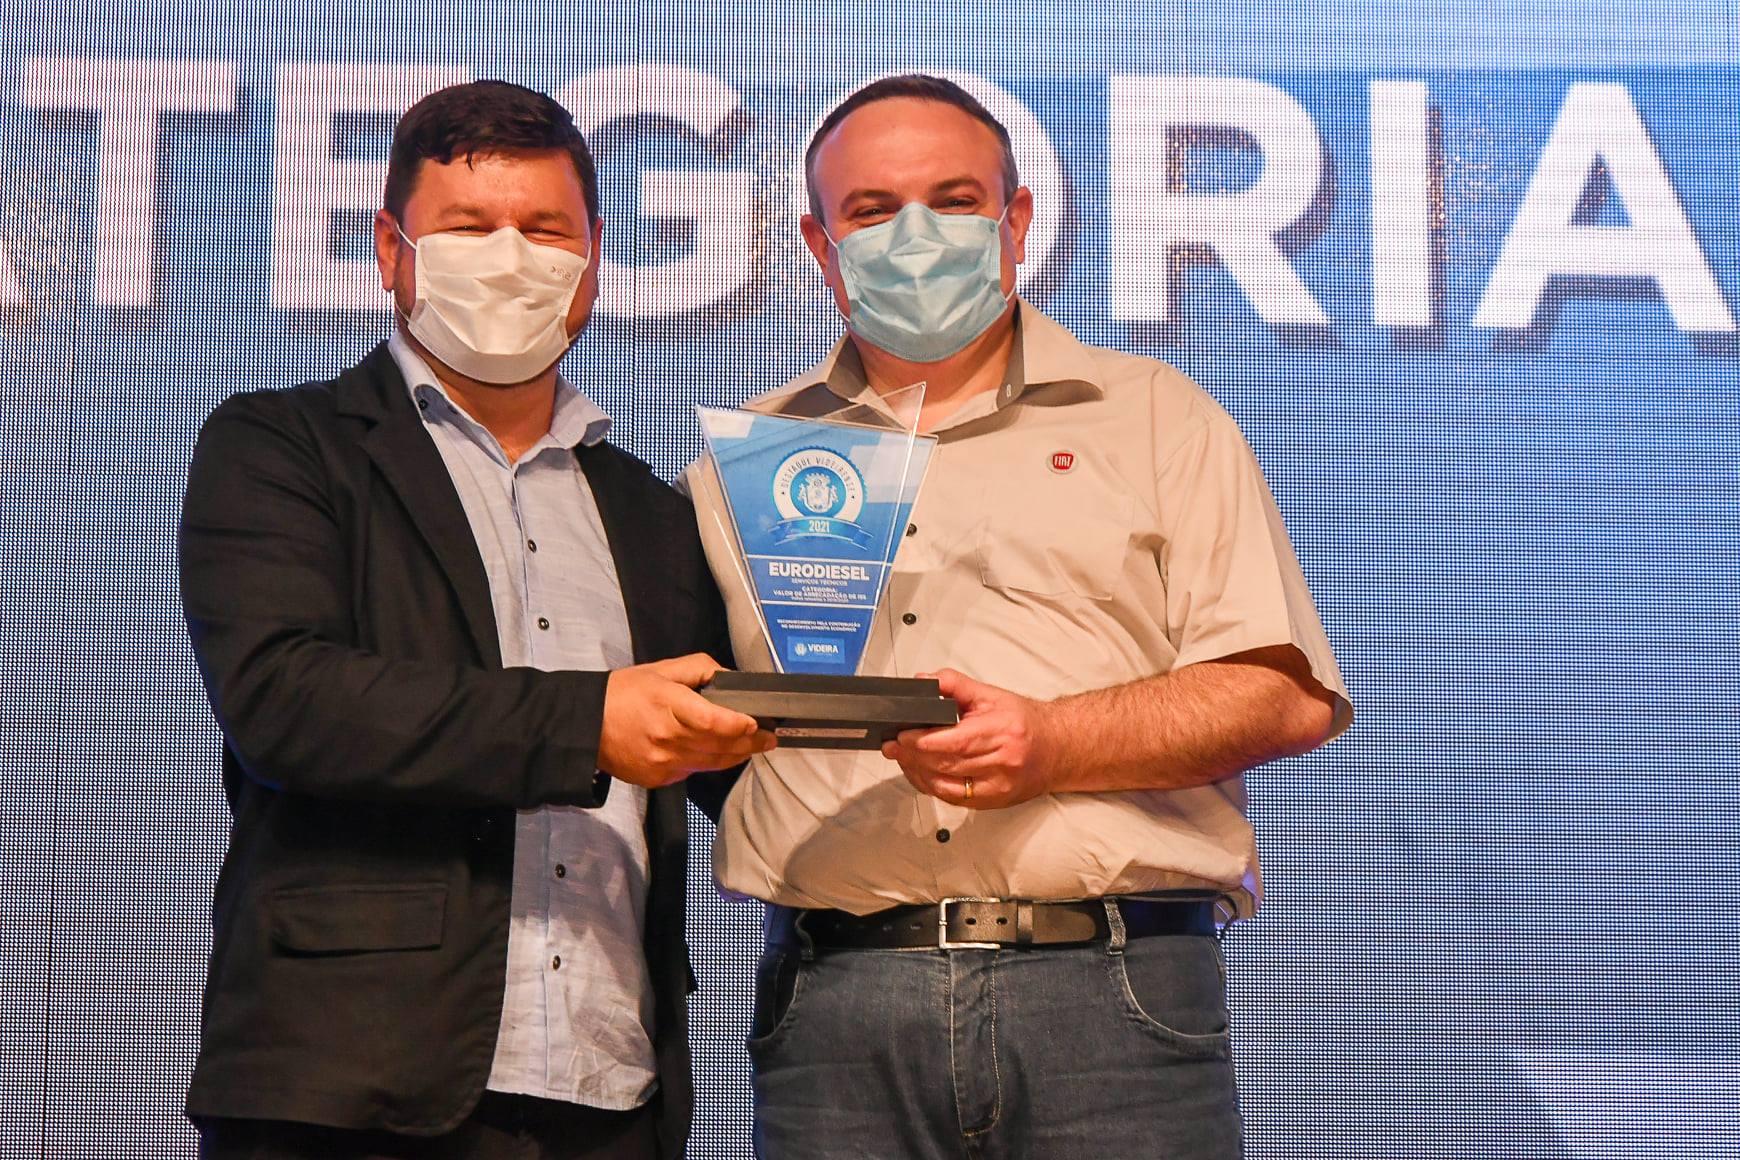 A Carboni é premiada novamente como Destaque Videirense 242475159 3276856065875075 4782587679392194198 n